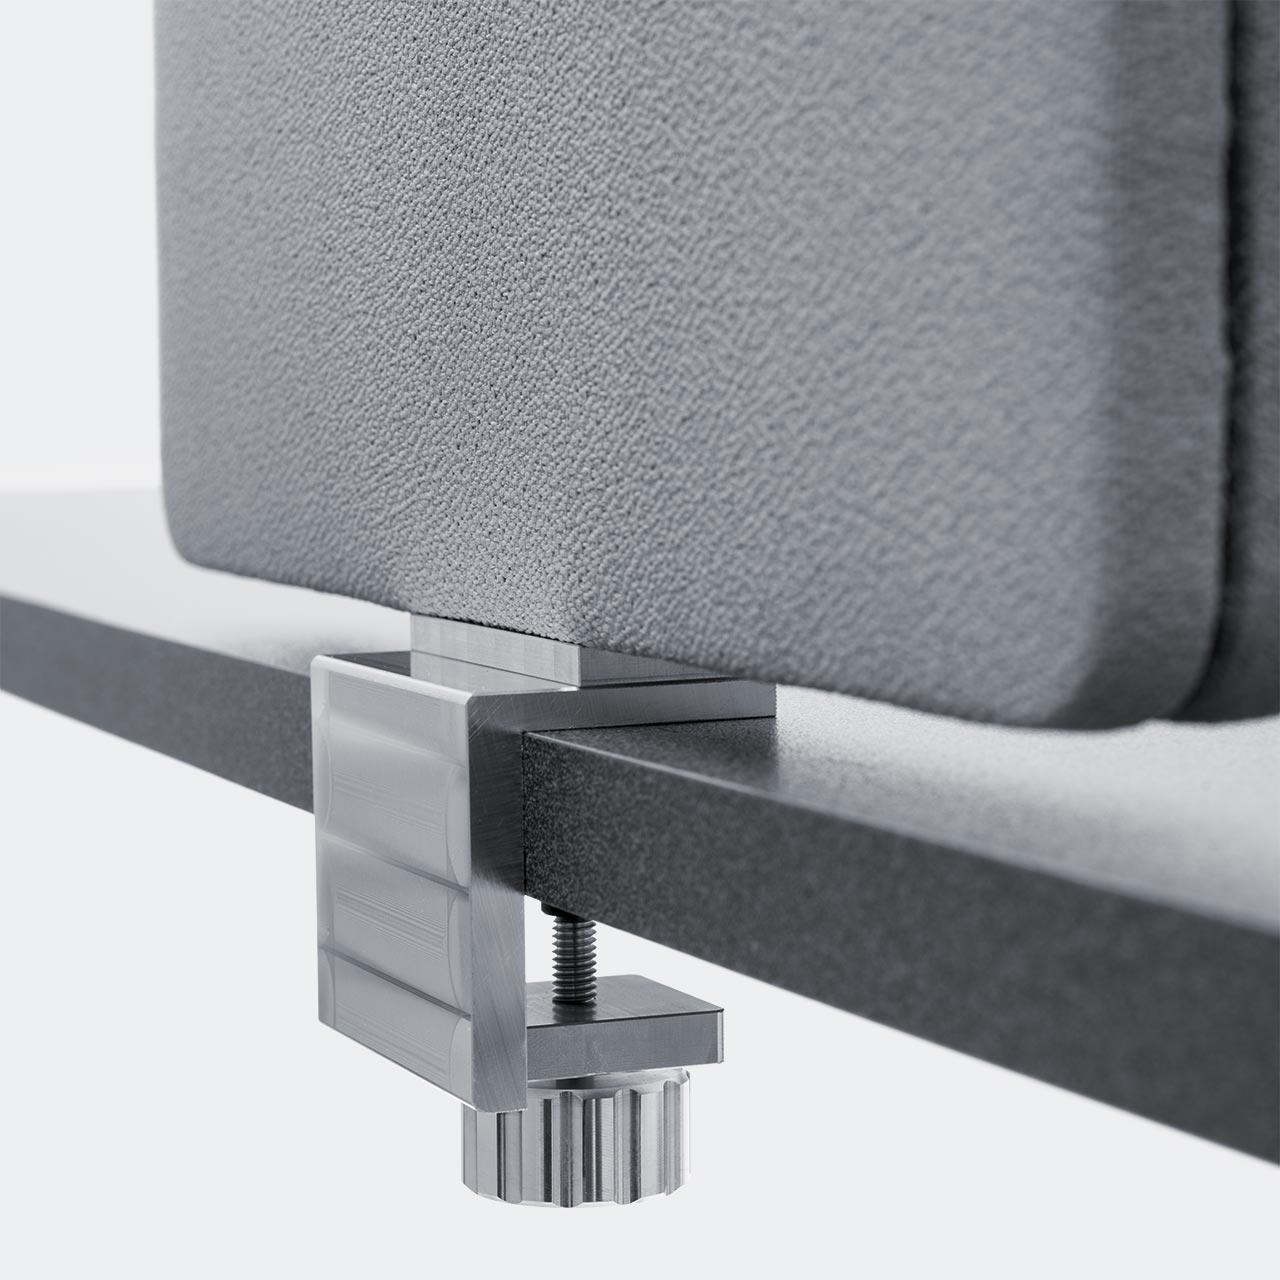 Tischaufsatze Wing On Table Direkter Schallabsorber B11